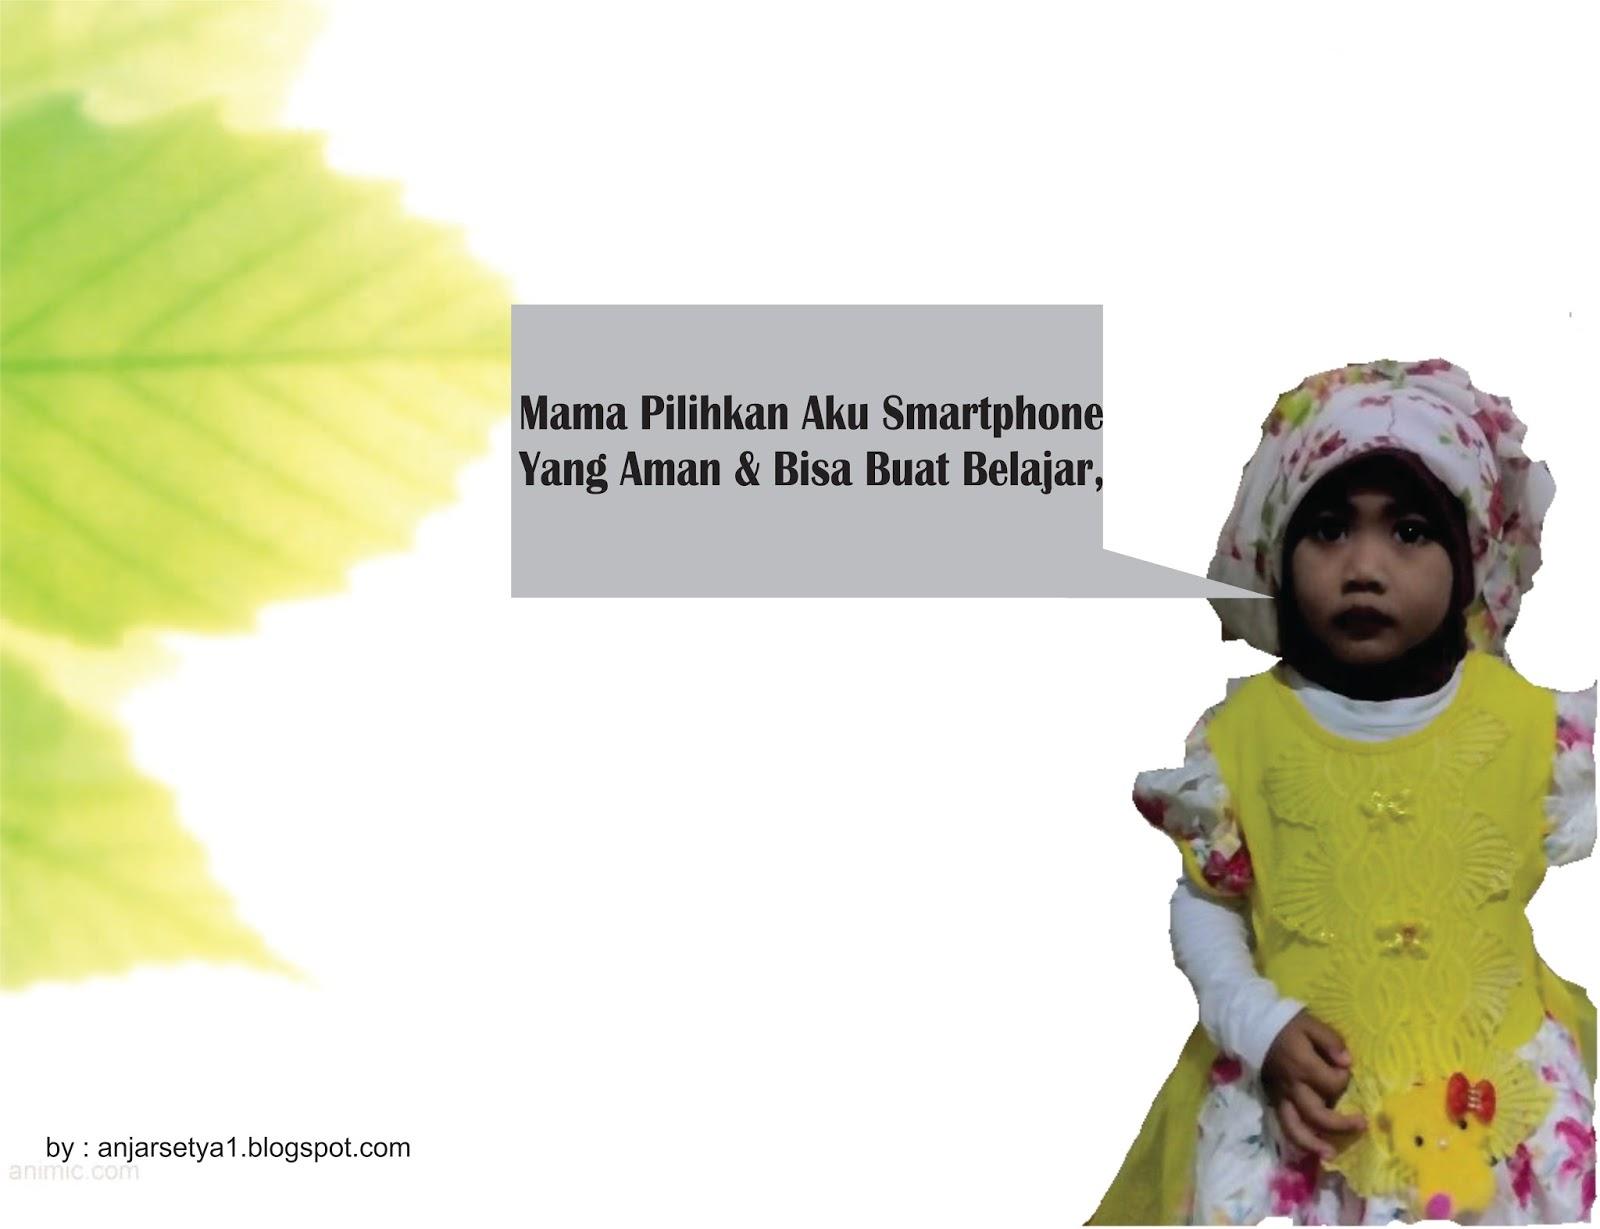 Mama Pilihkan Aku Smartphone Yang Aman Fly Without Wings